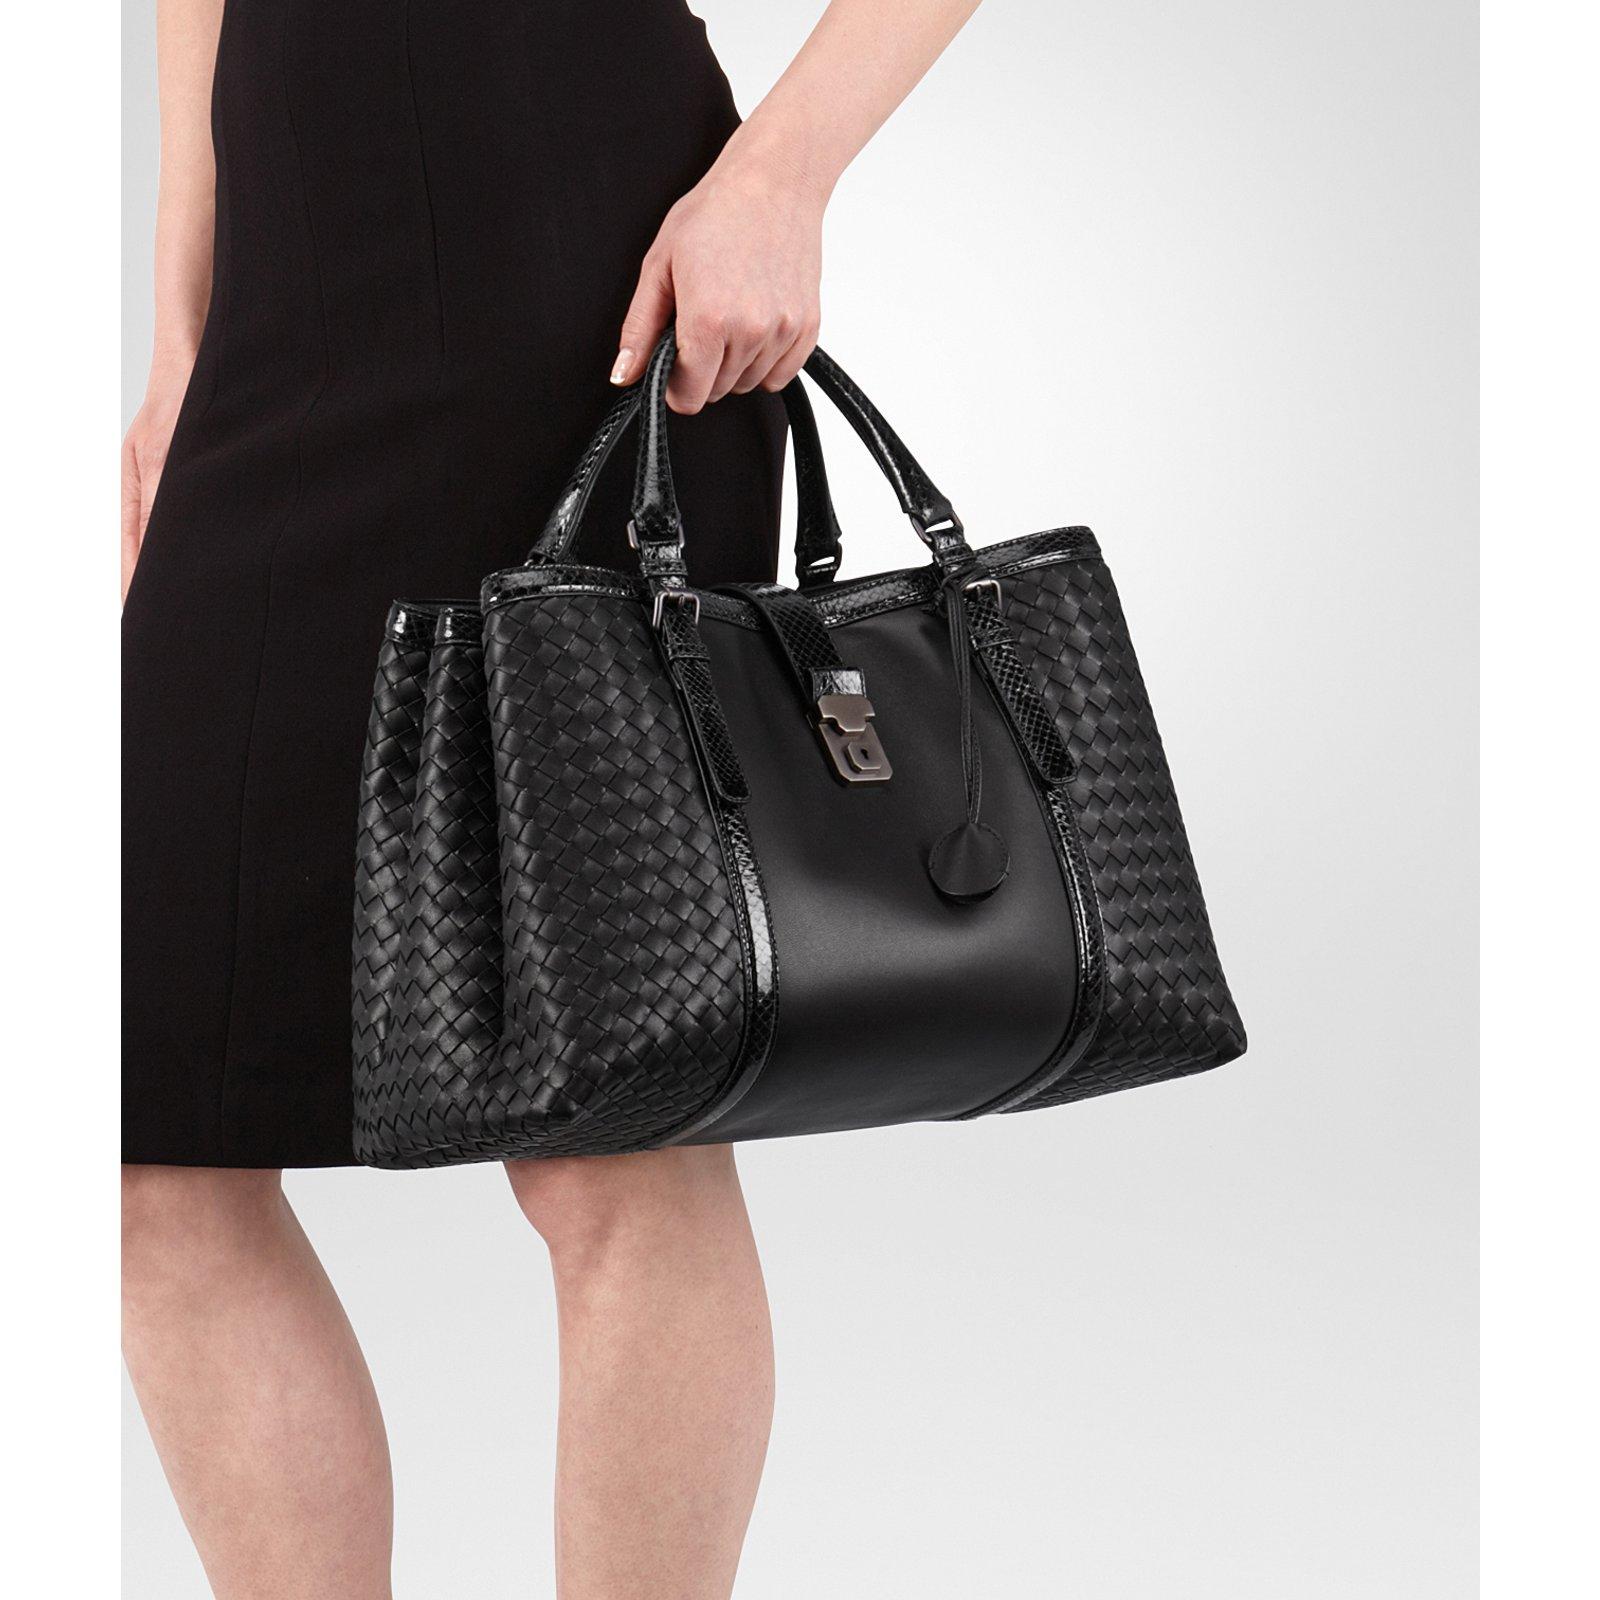 Bottega Veneta AYERS SNAKE AND NAPPA Handbags Leather d267a810cd022